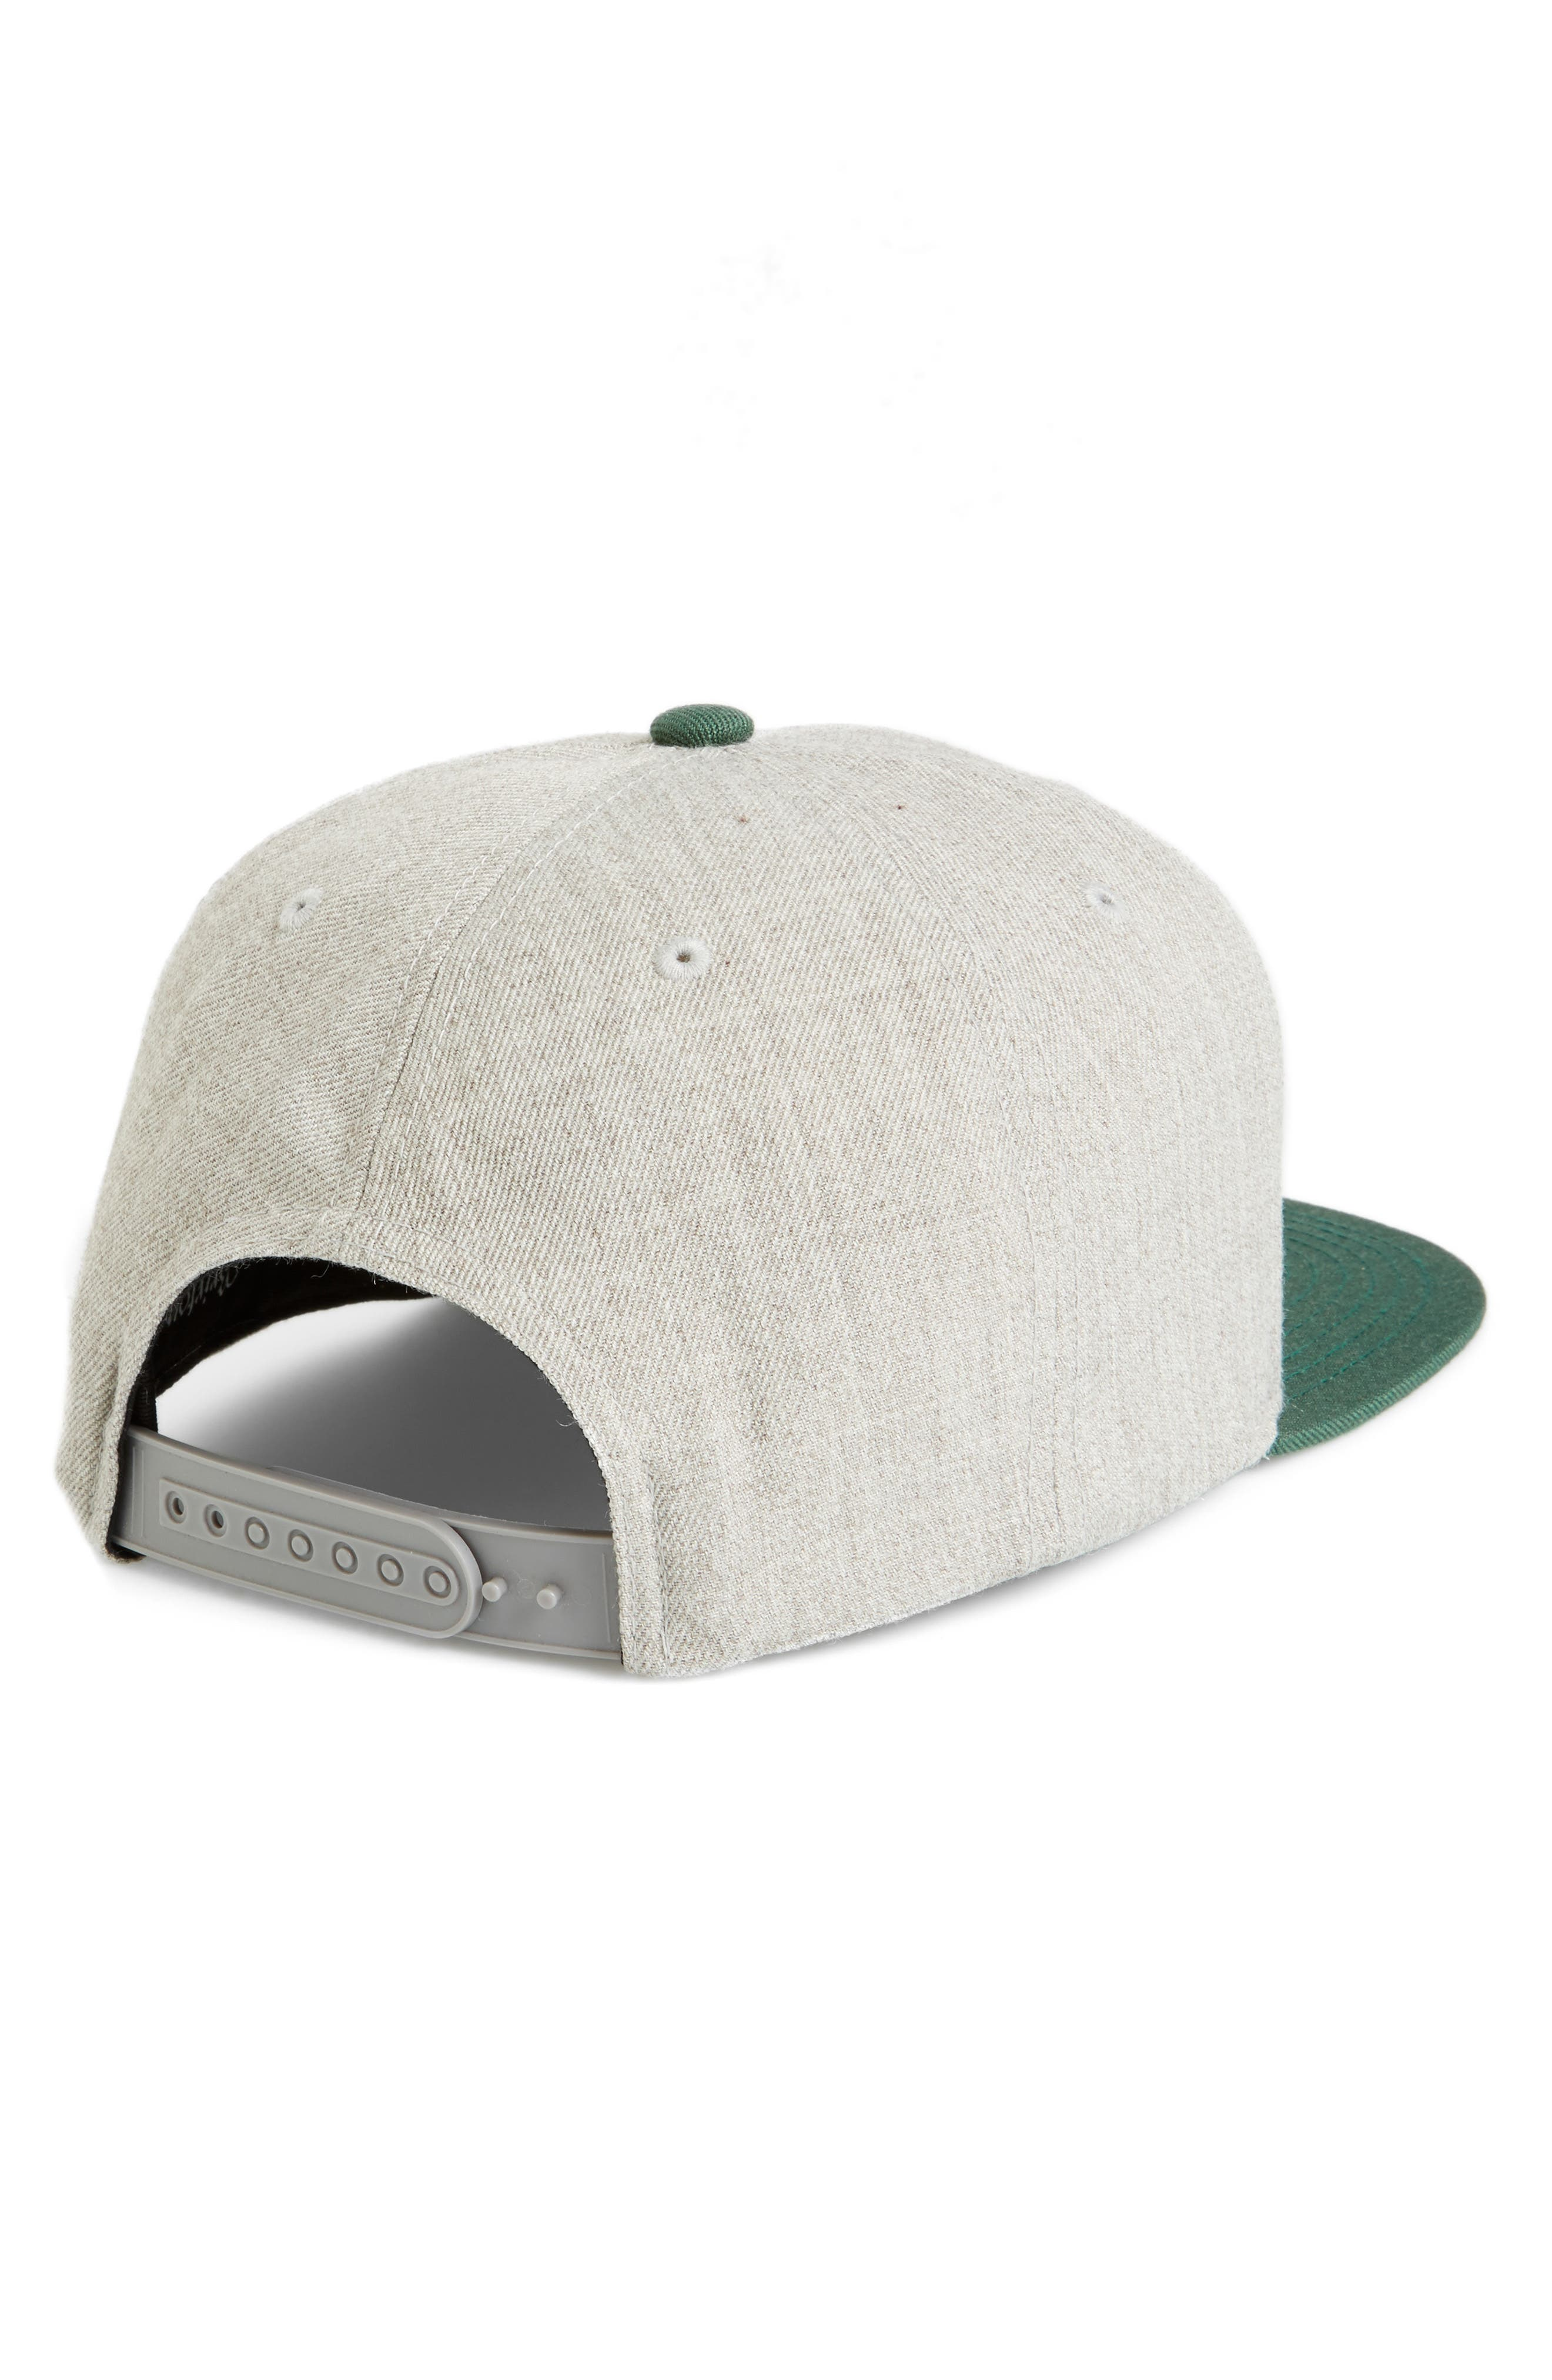 Rival Snapback Baseball Cap,                             Alternate thumbnail 2, color,                             050